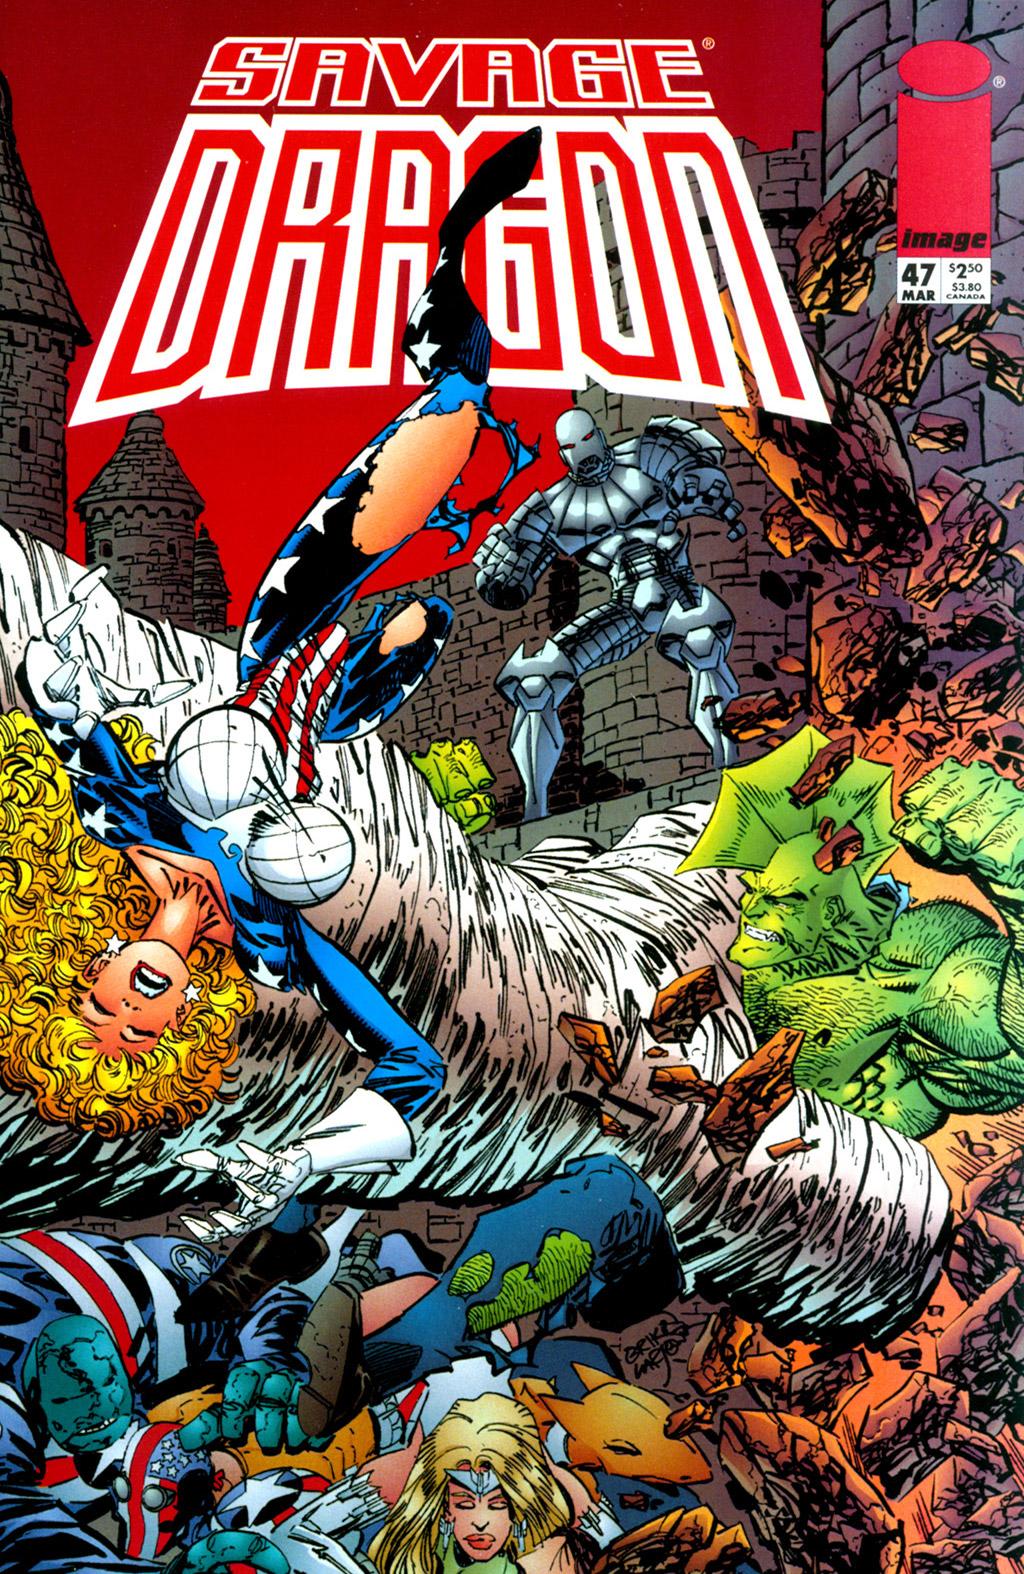 Cover Savage Dragon Vol.2 #47